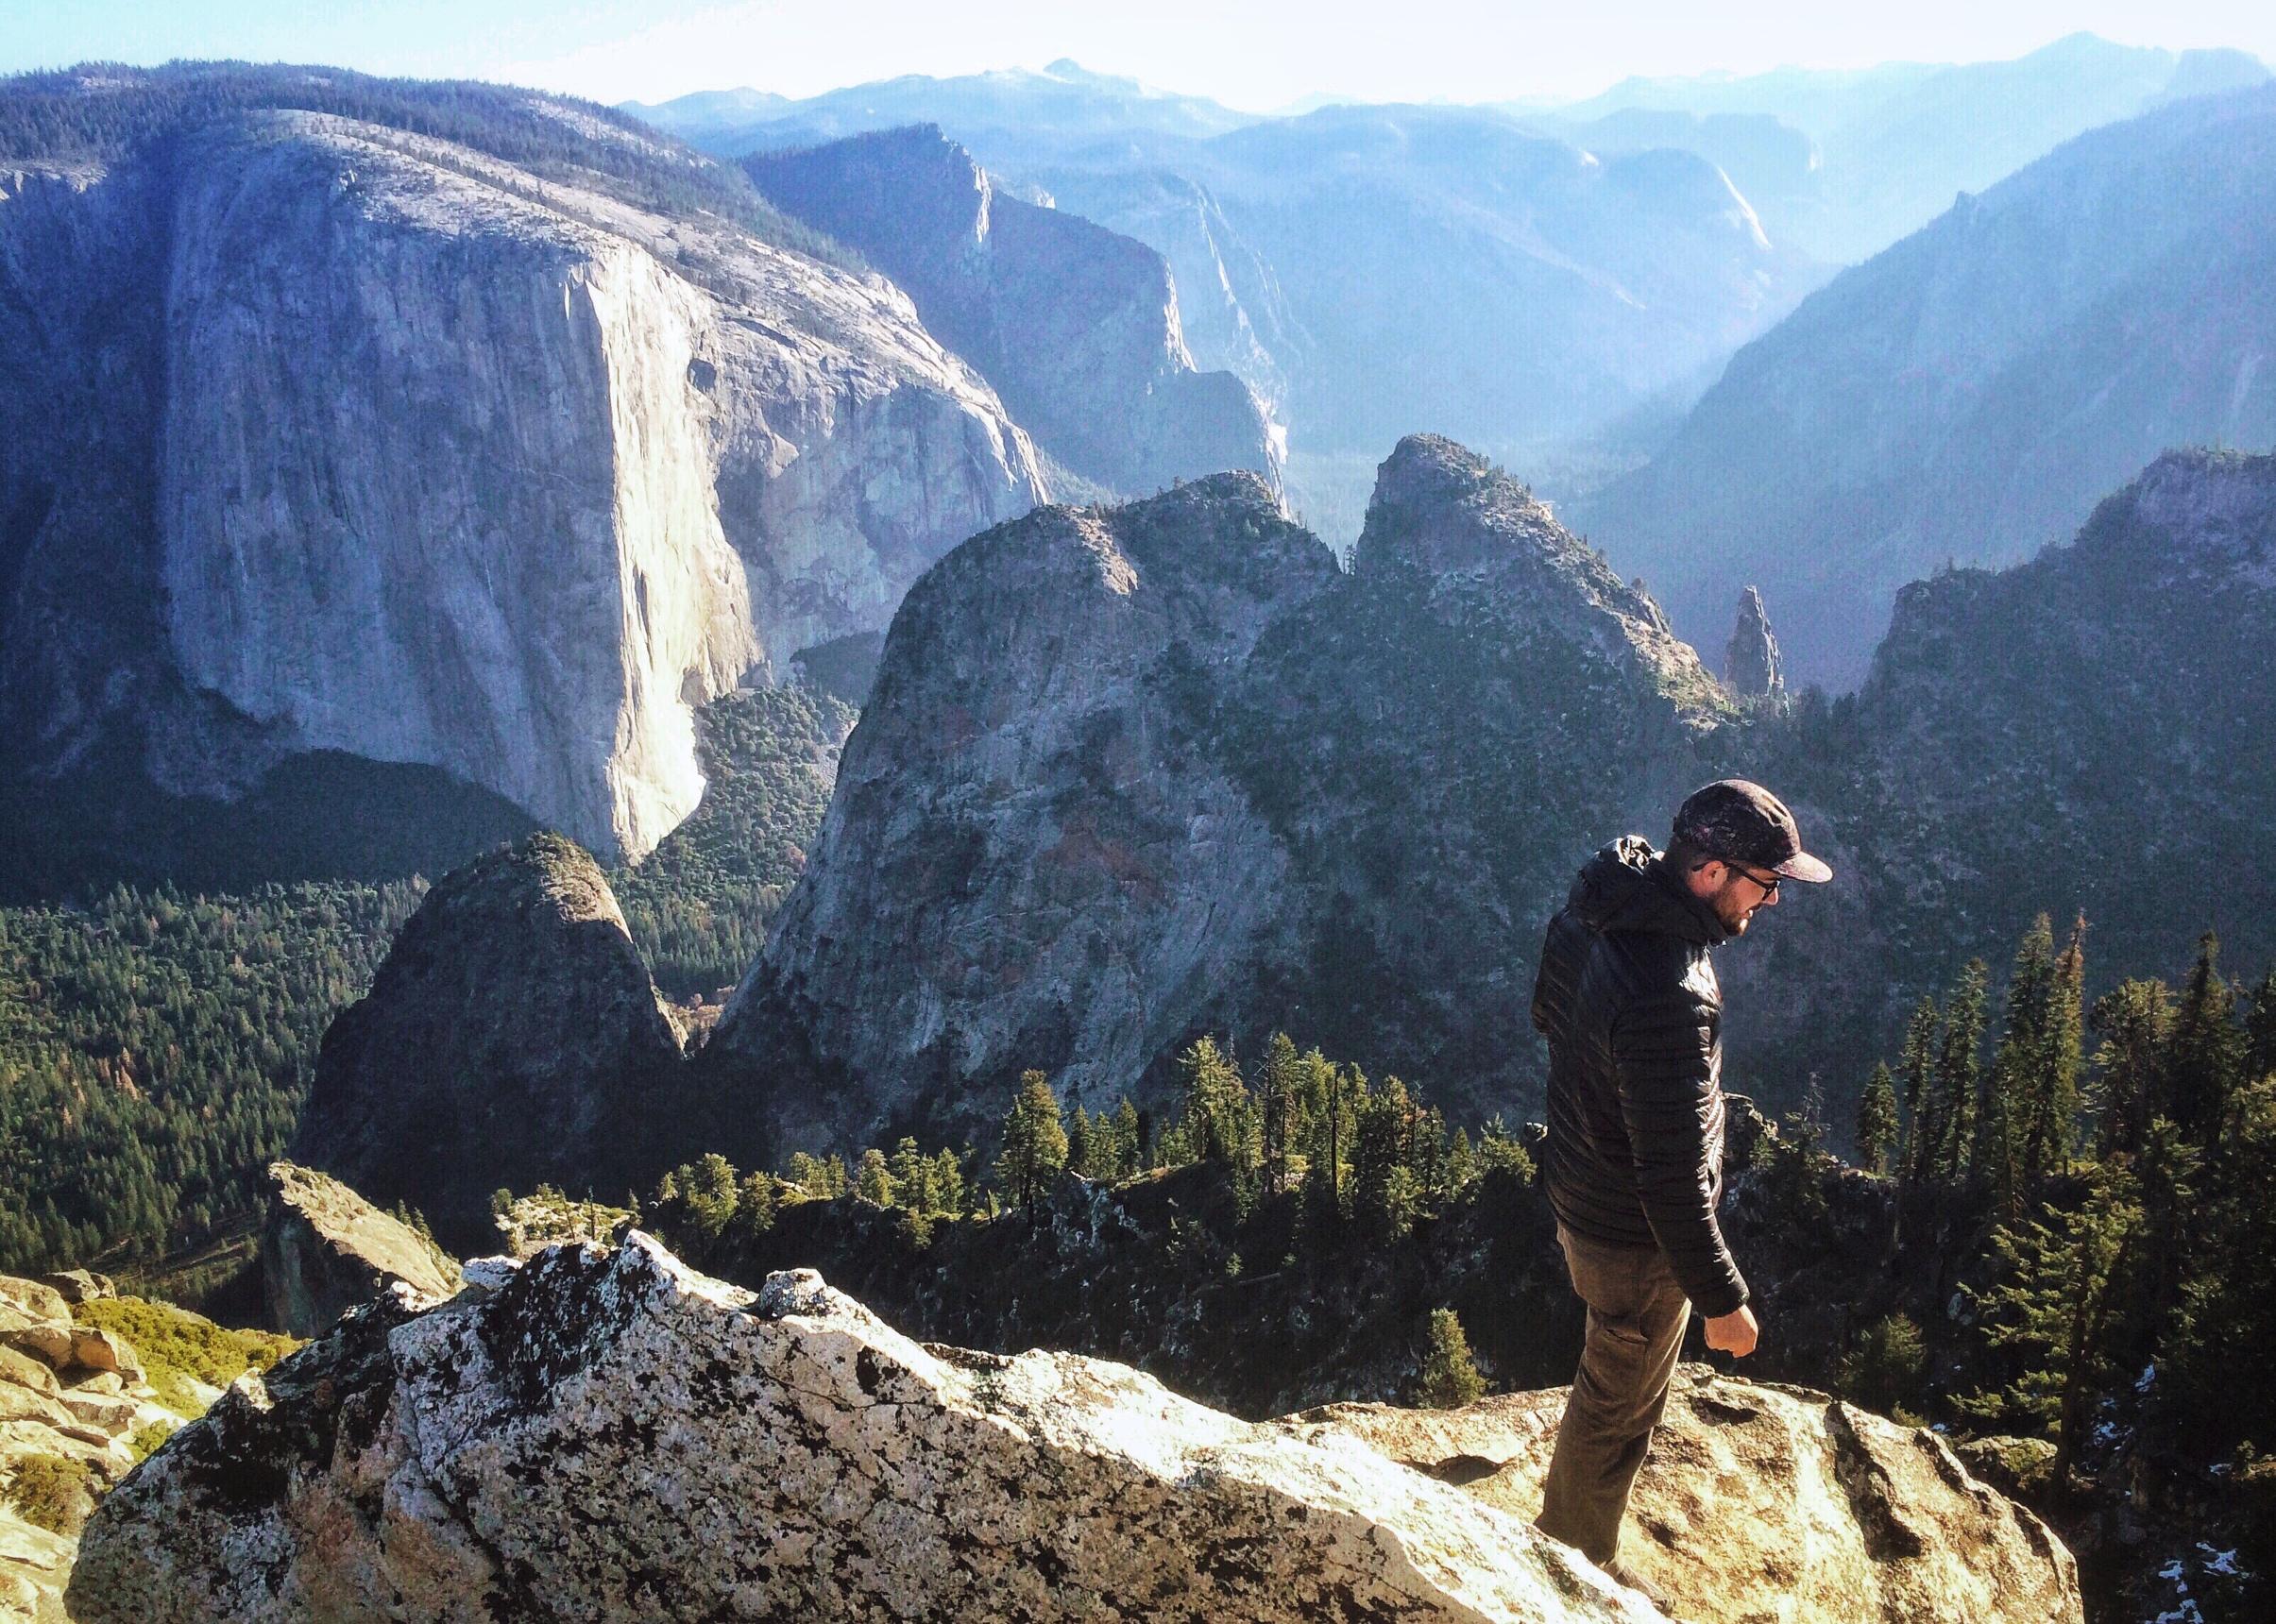 thisworldexists this world exists miranda leconte adventure travel outdoor yosemite